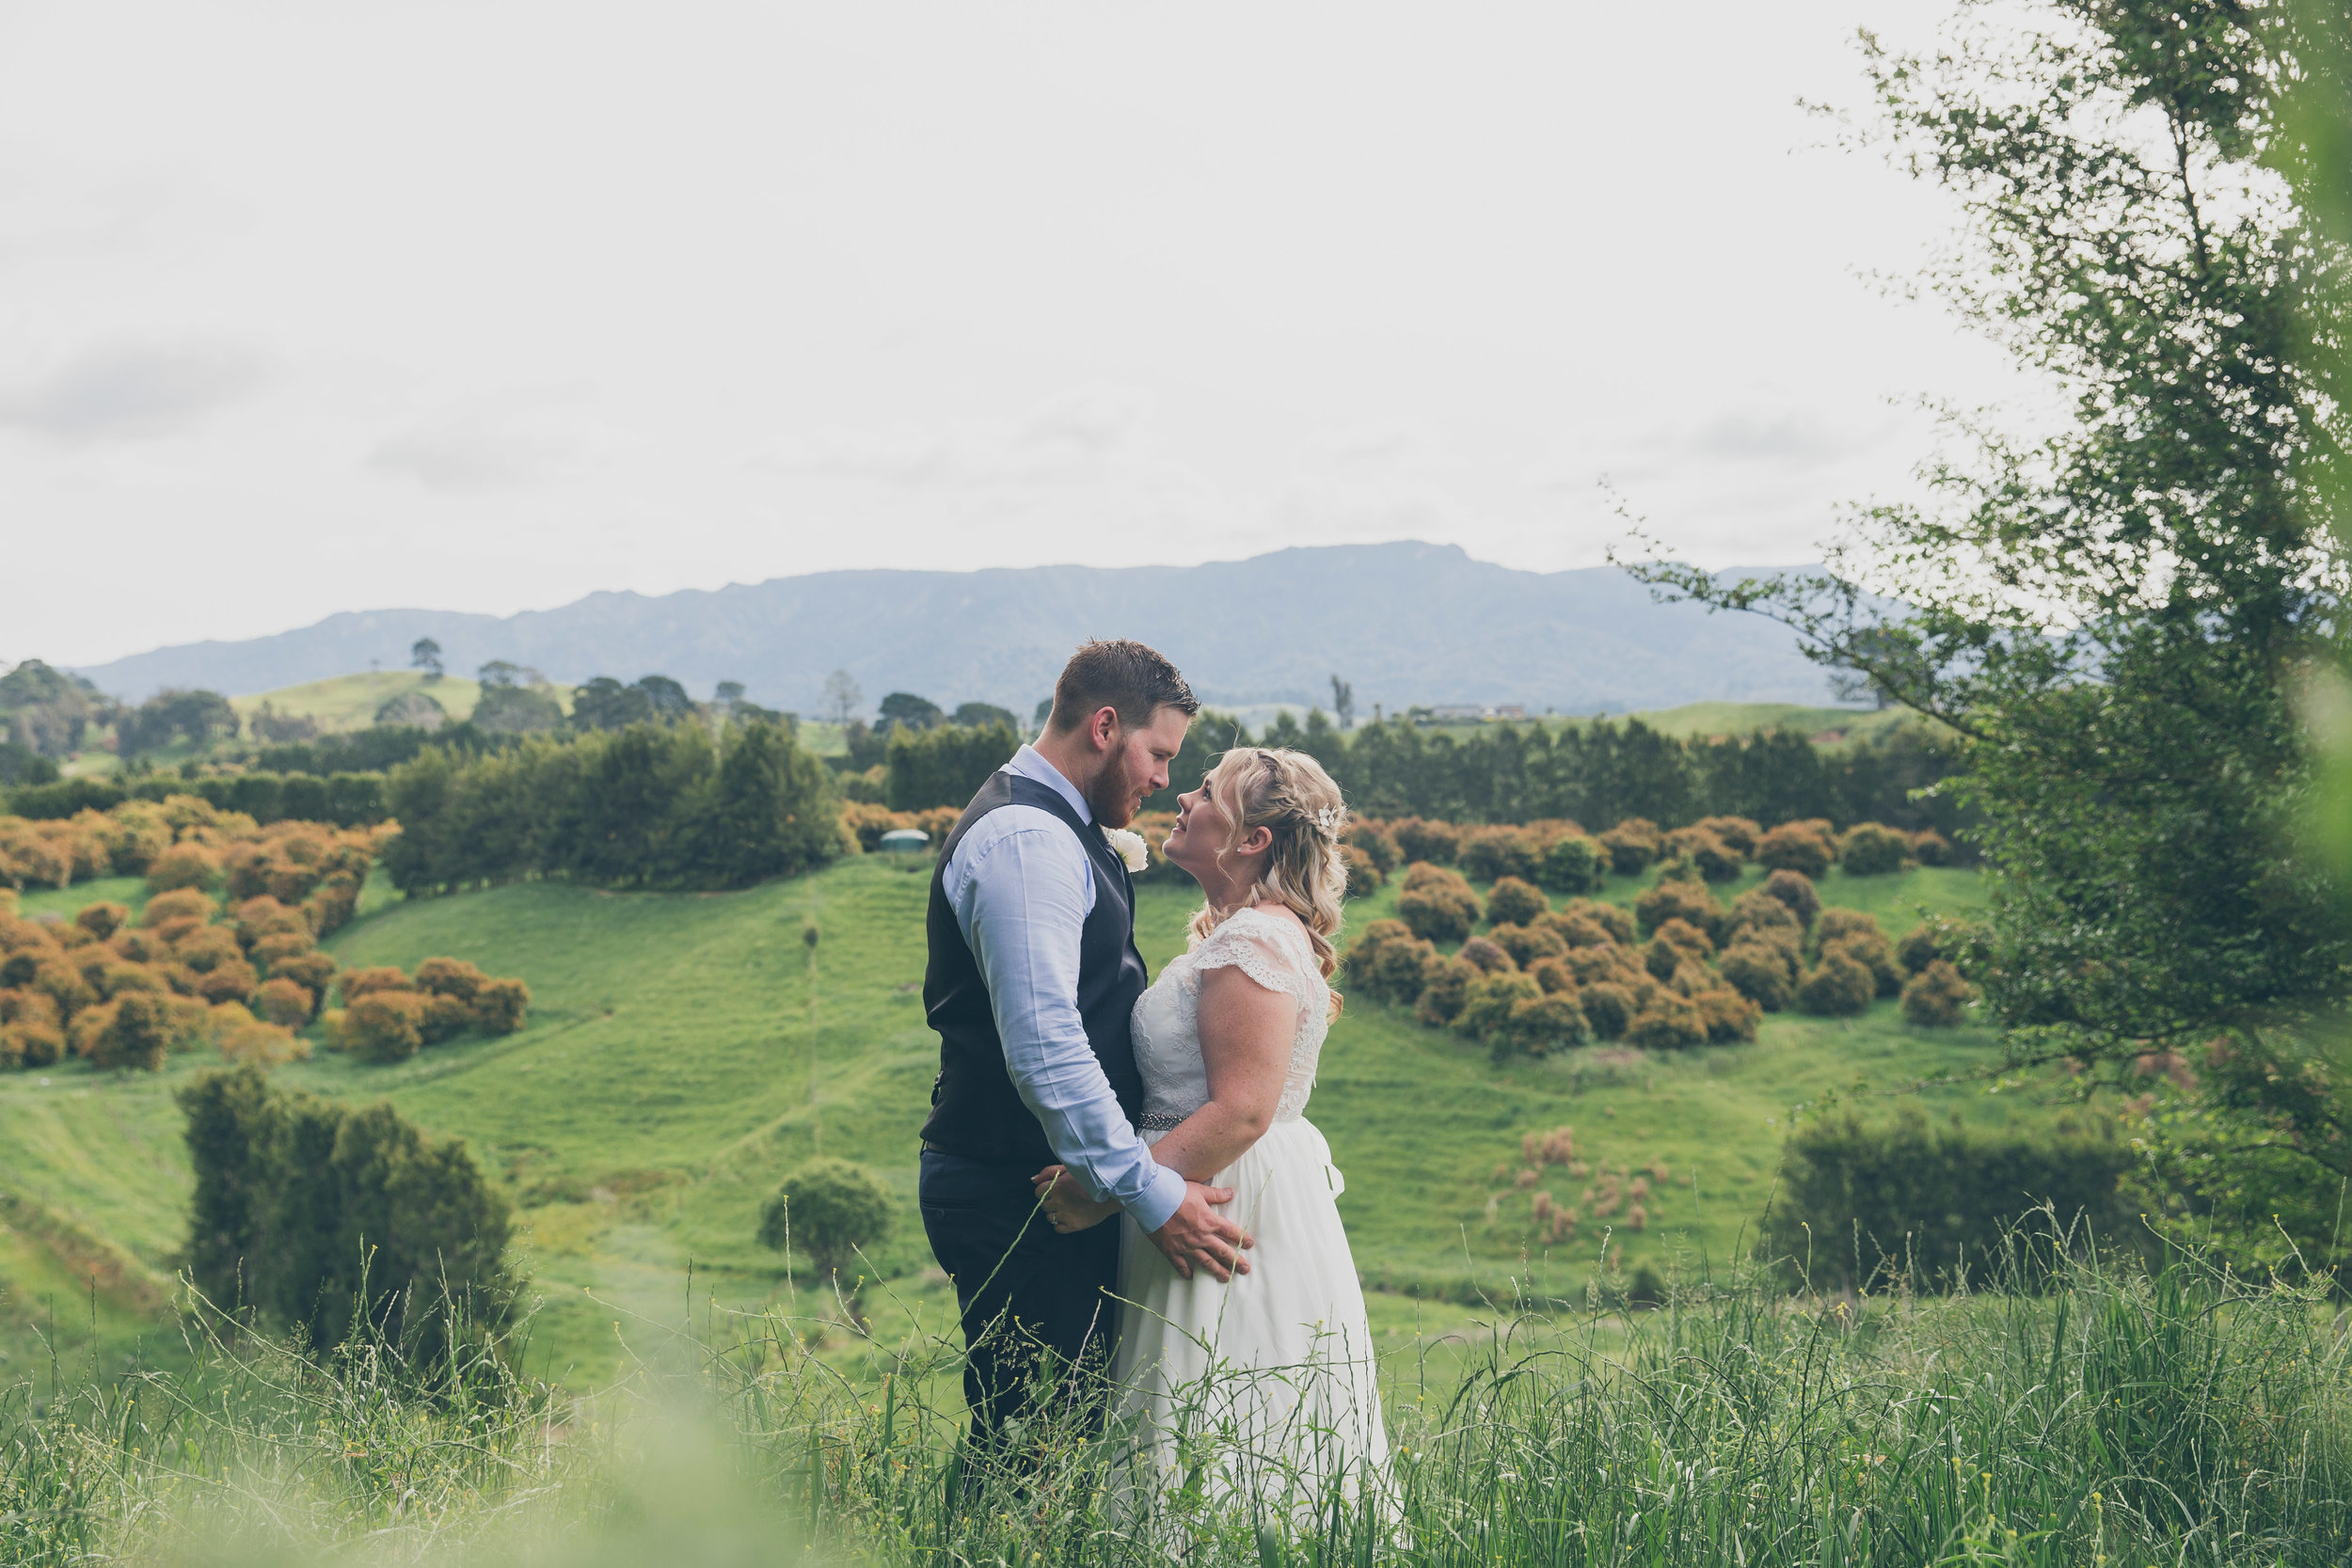 K & S - Wedding - Oh Joy! Photography - Tauranga, New Zealand-5.jpg